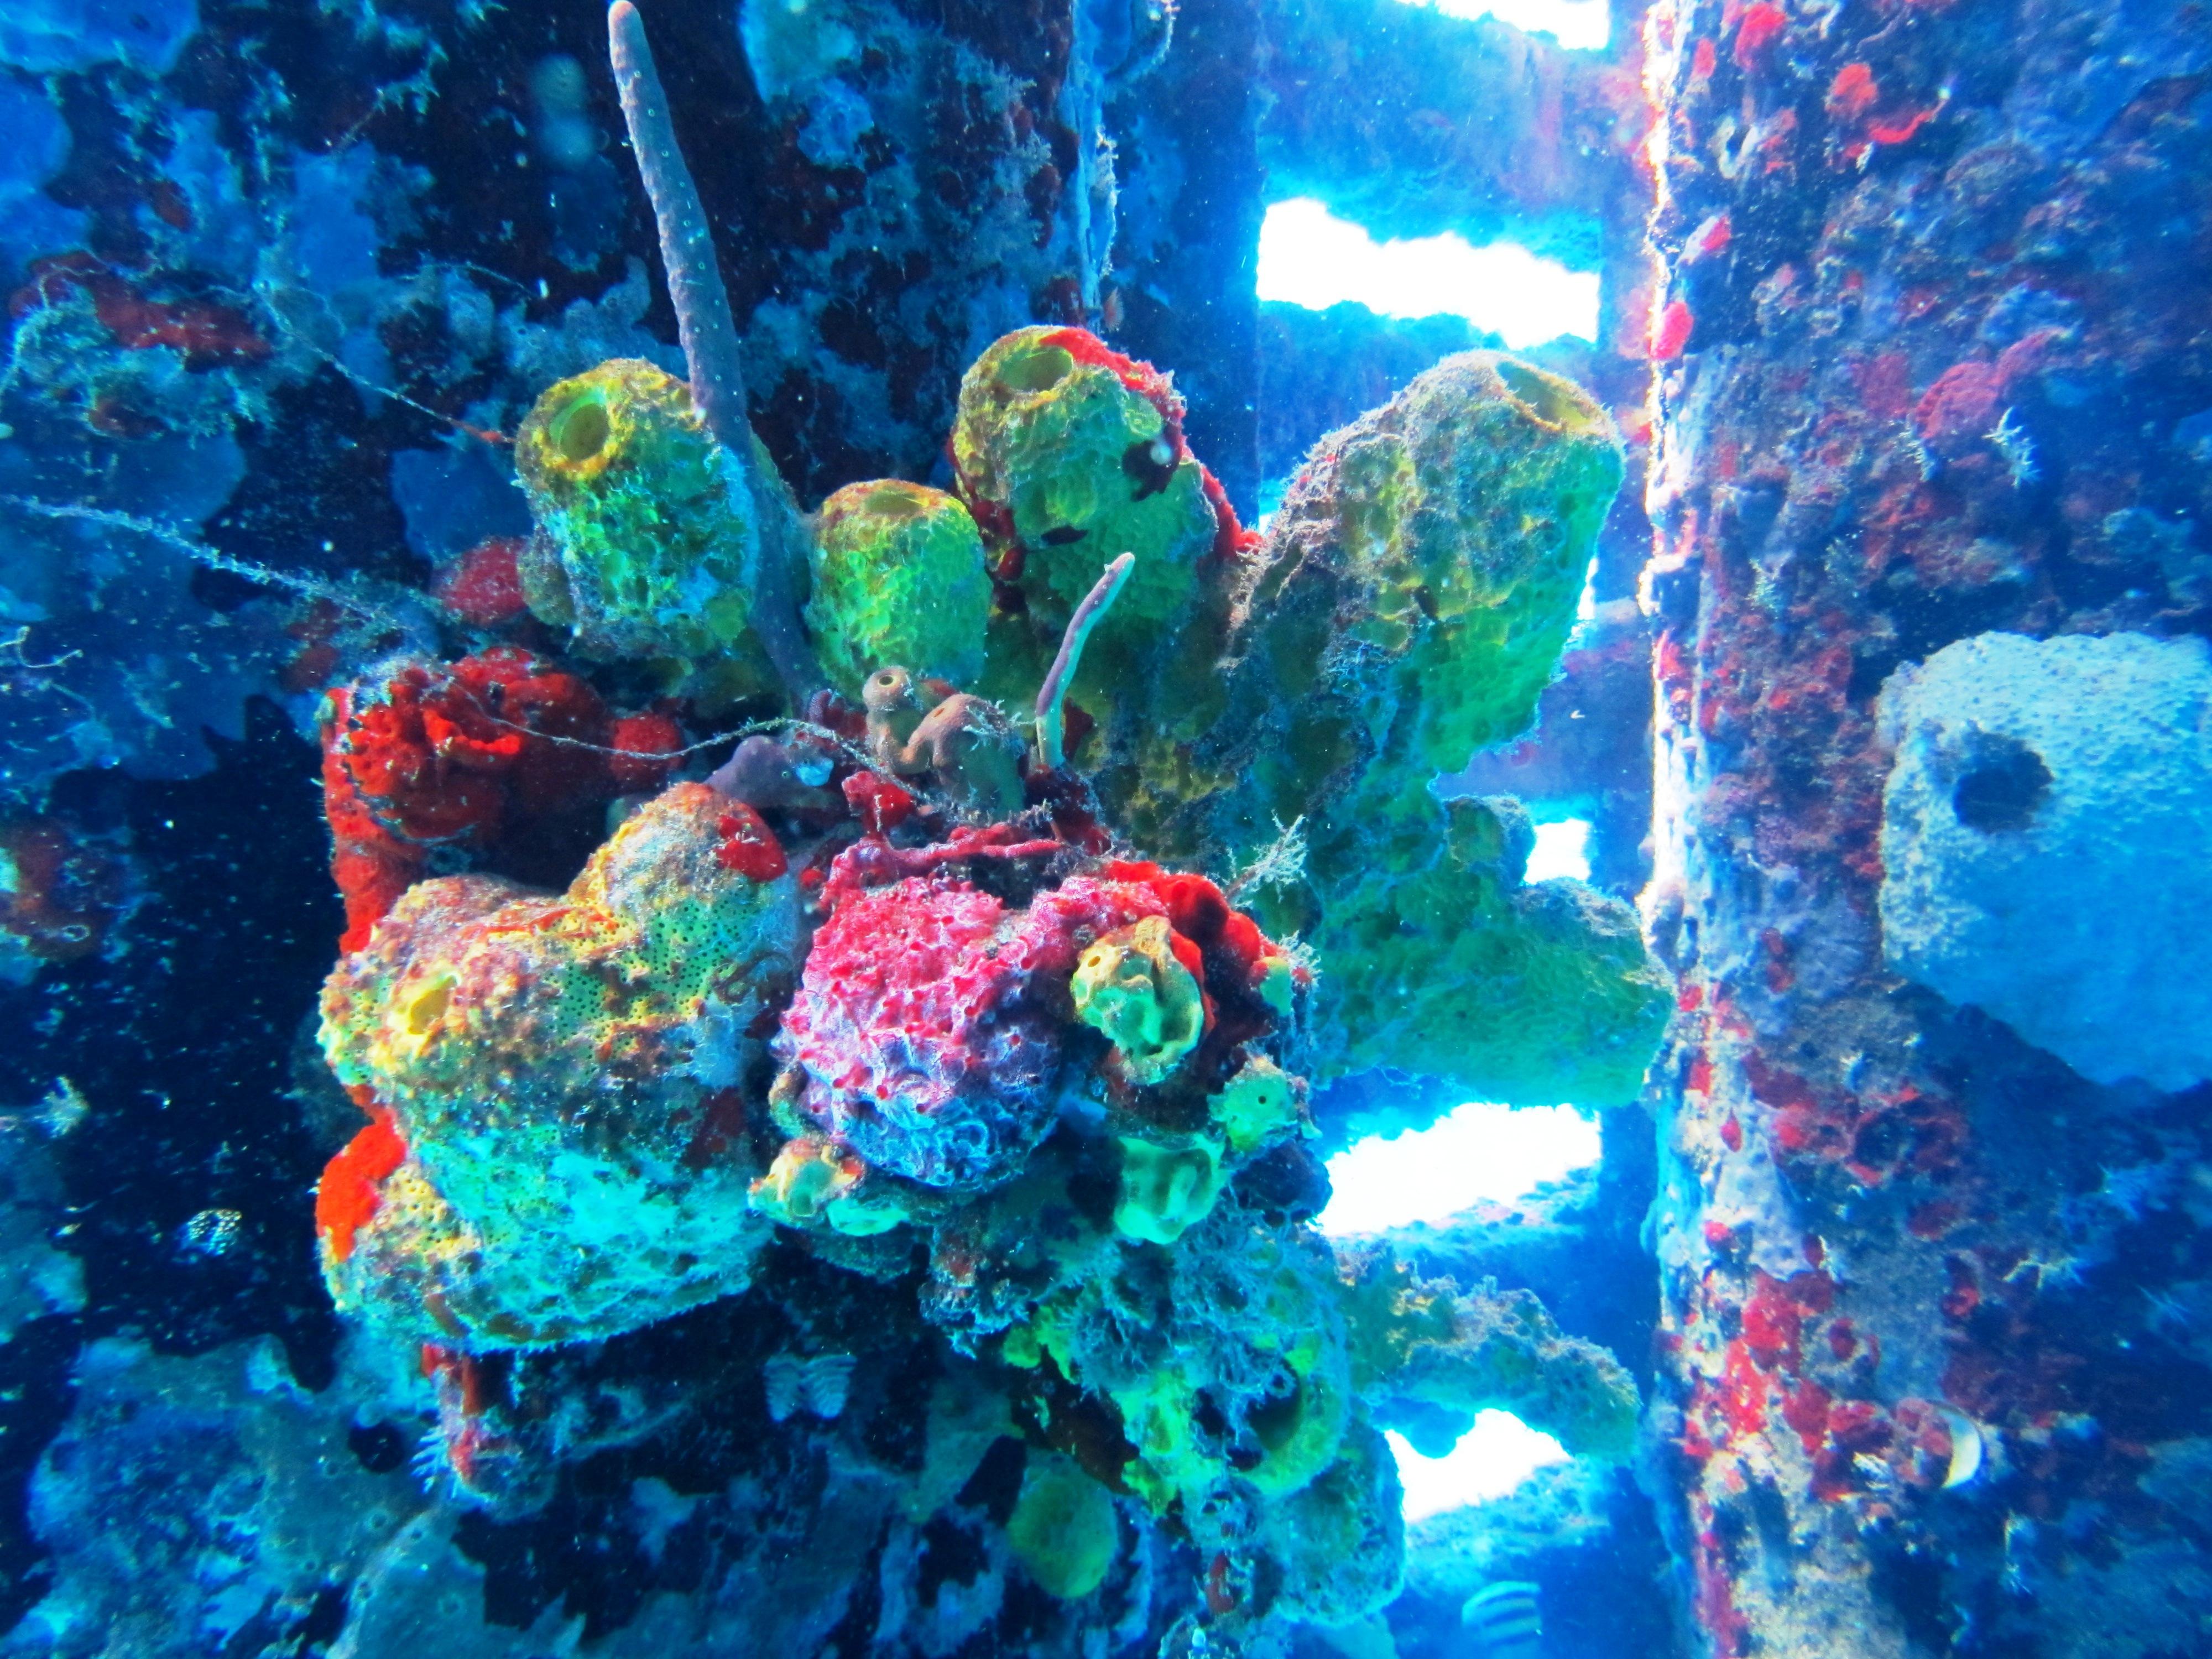 Sponges on the Fredricksted peir